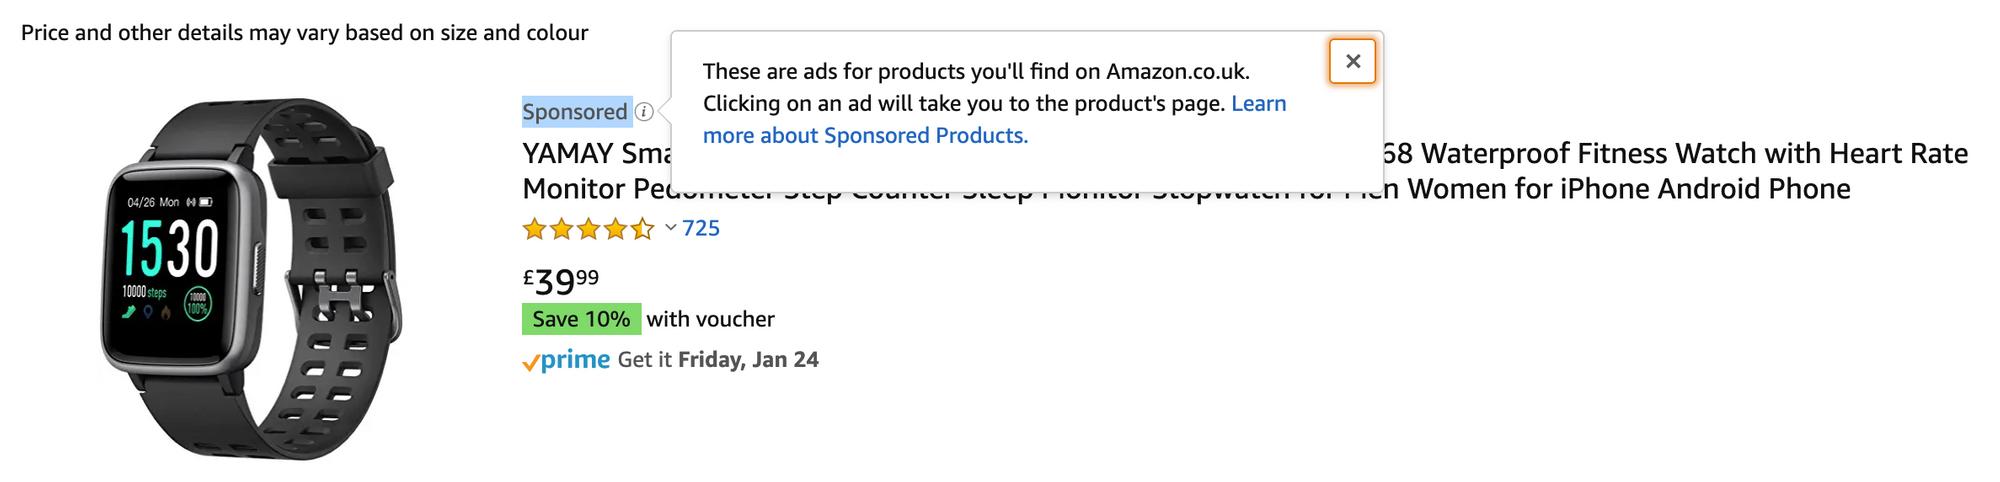 Seelk - Amazon Retail Media Analytics Software